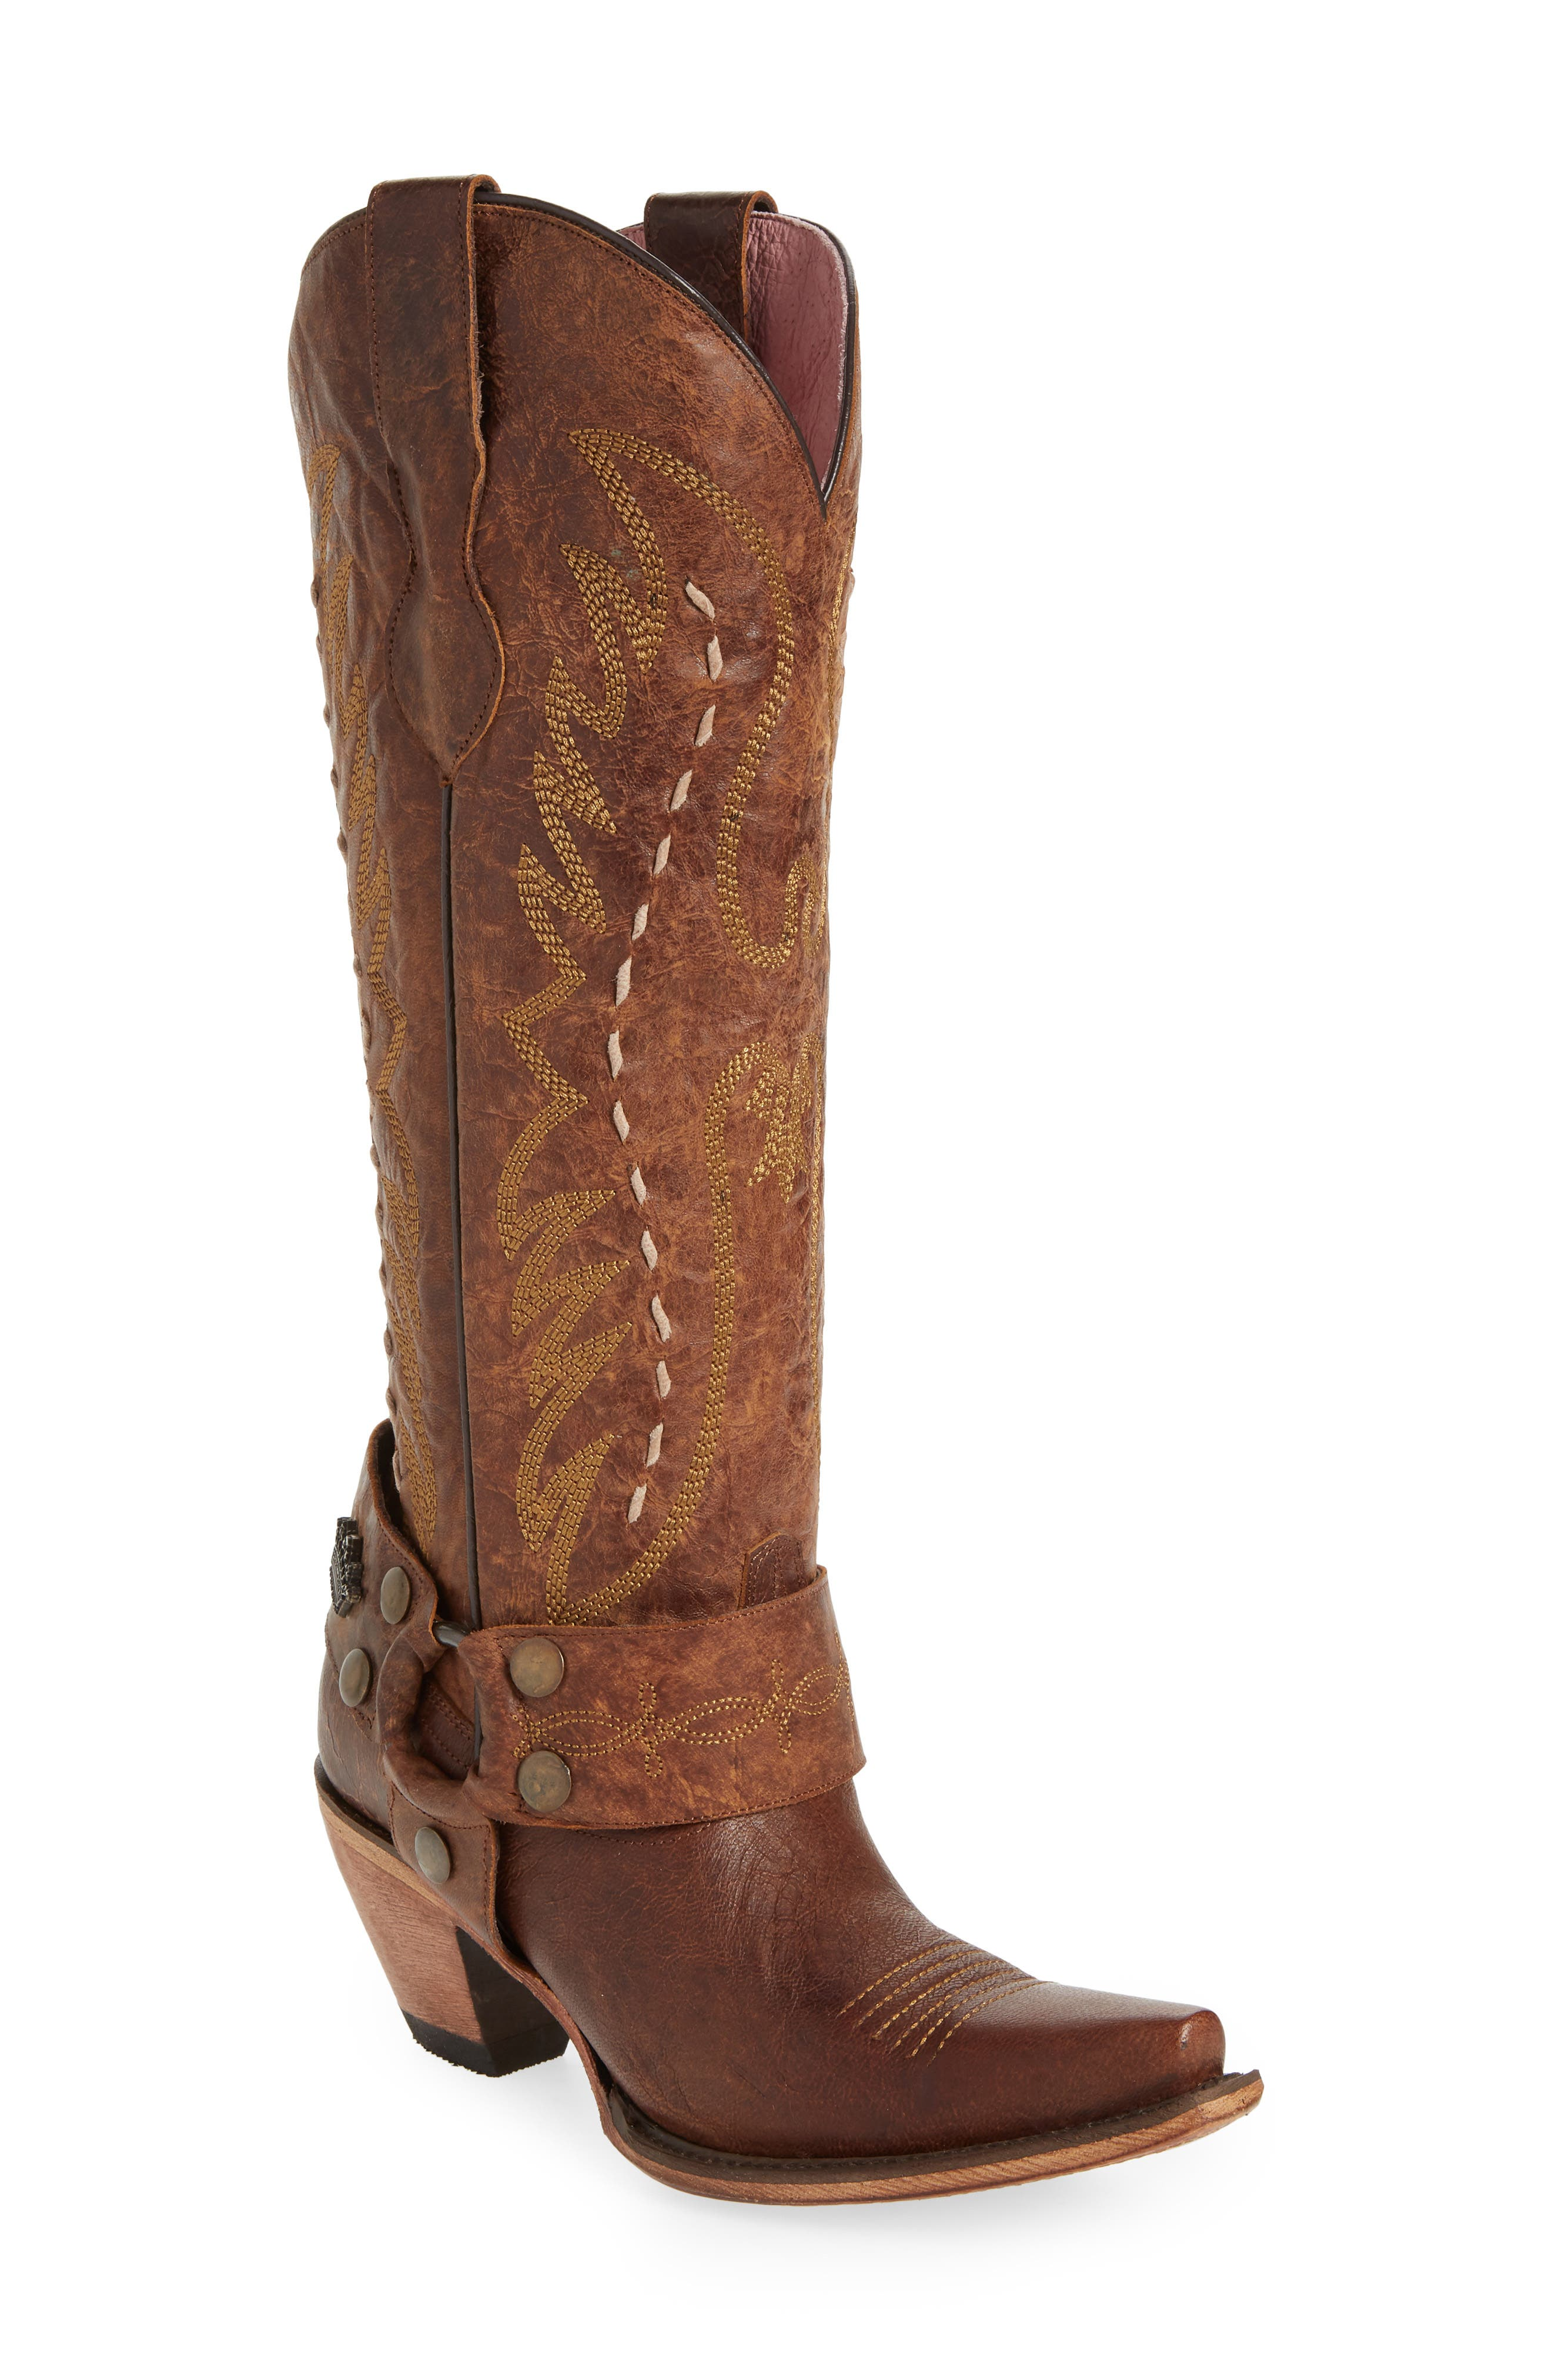 X Junk Gypsy Vagabond Harness Boot